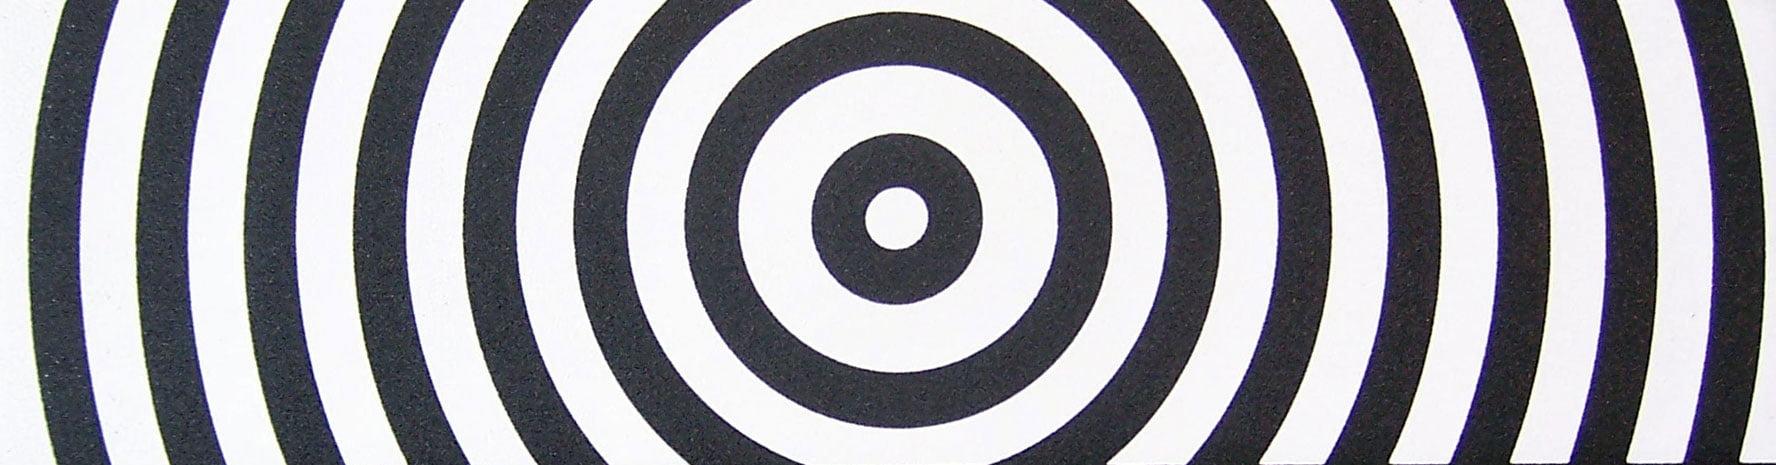 9x33in SKATEBOARD GRIPTAPE Target Professional Grip Tape by Black Diamond by